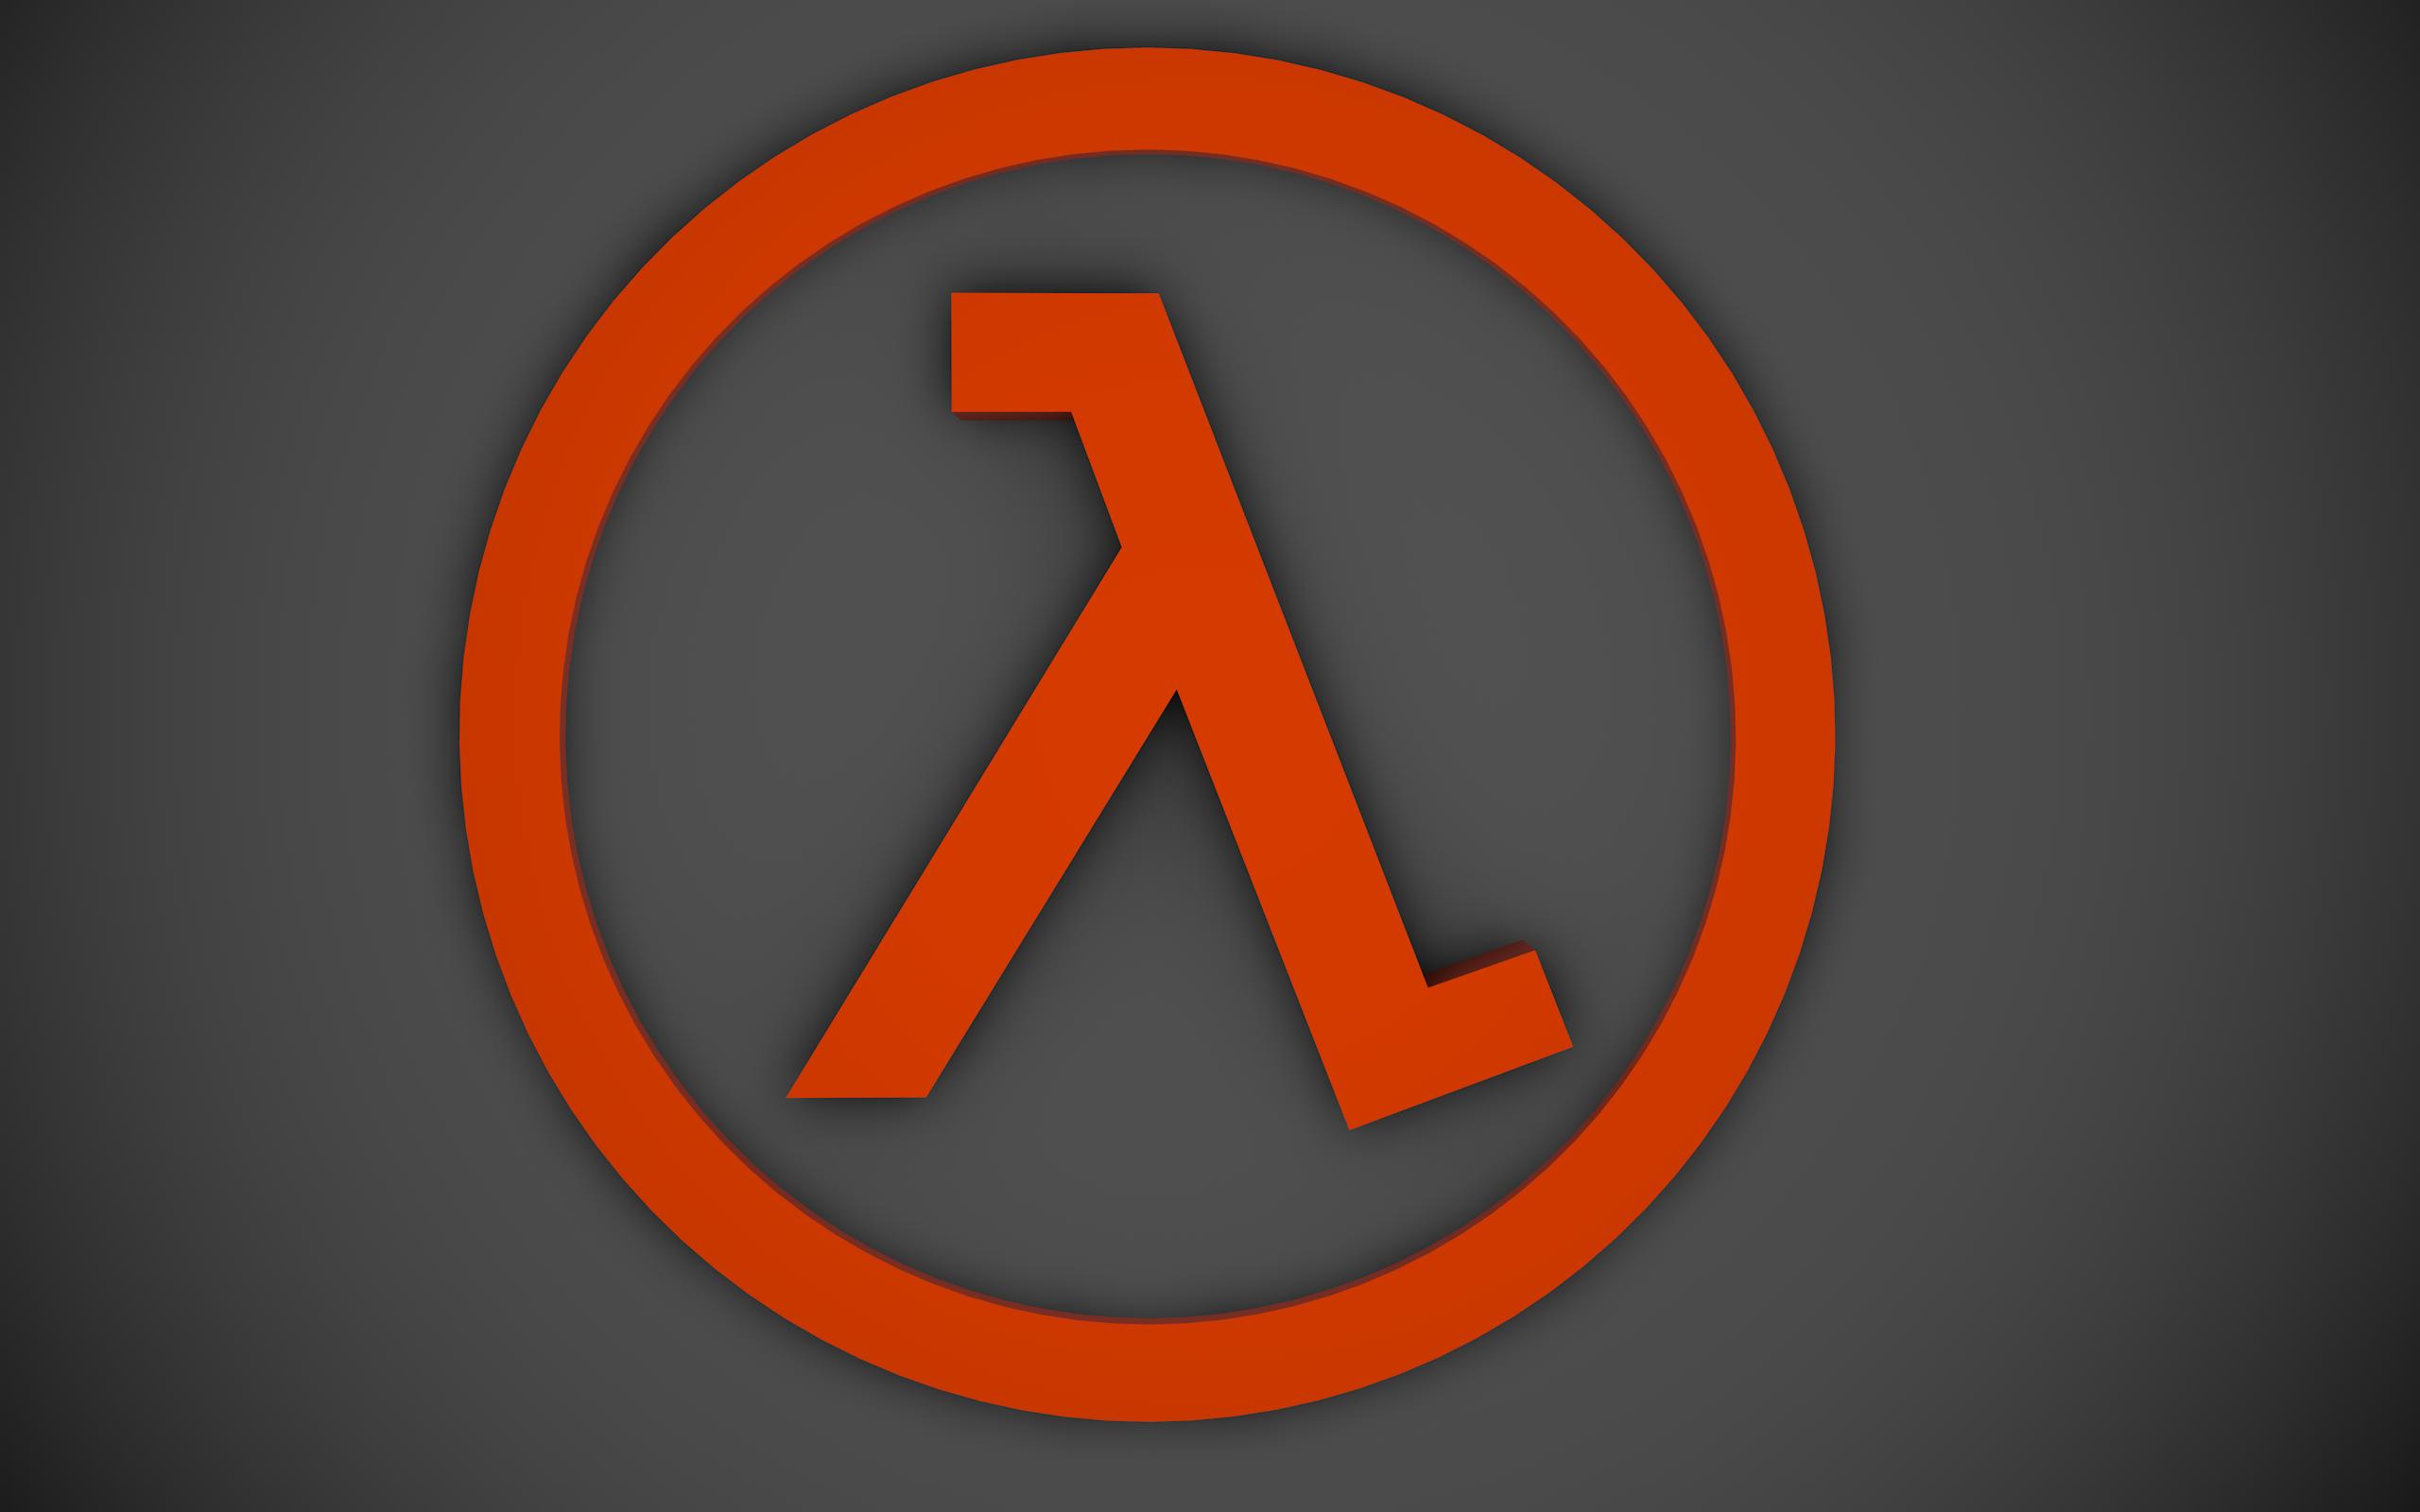 Half Life Logos